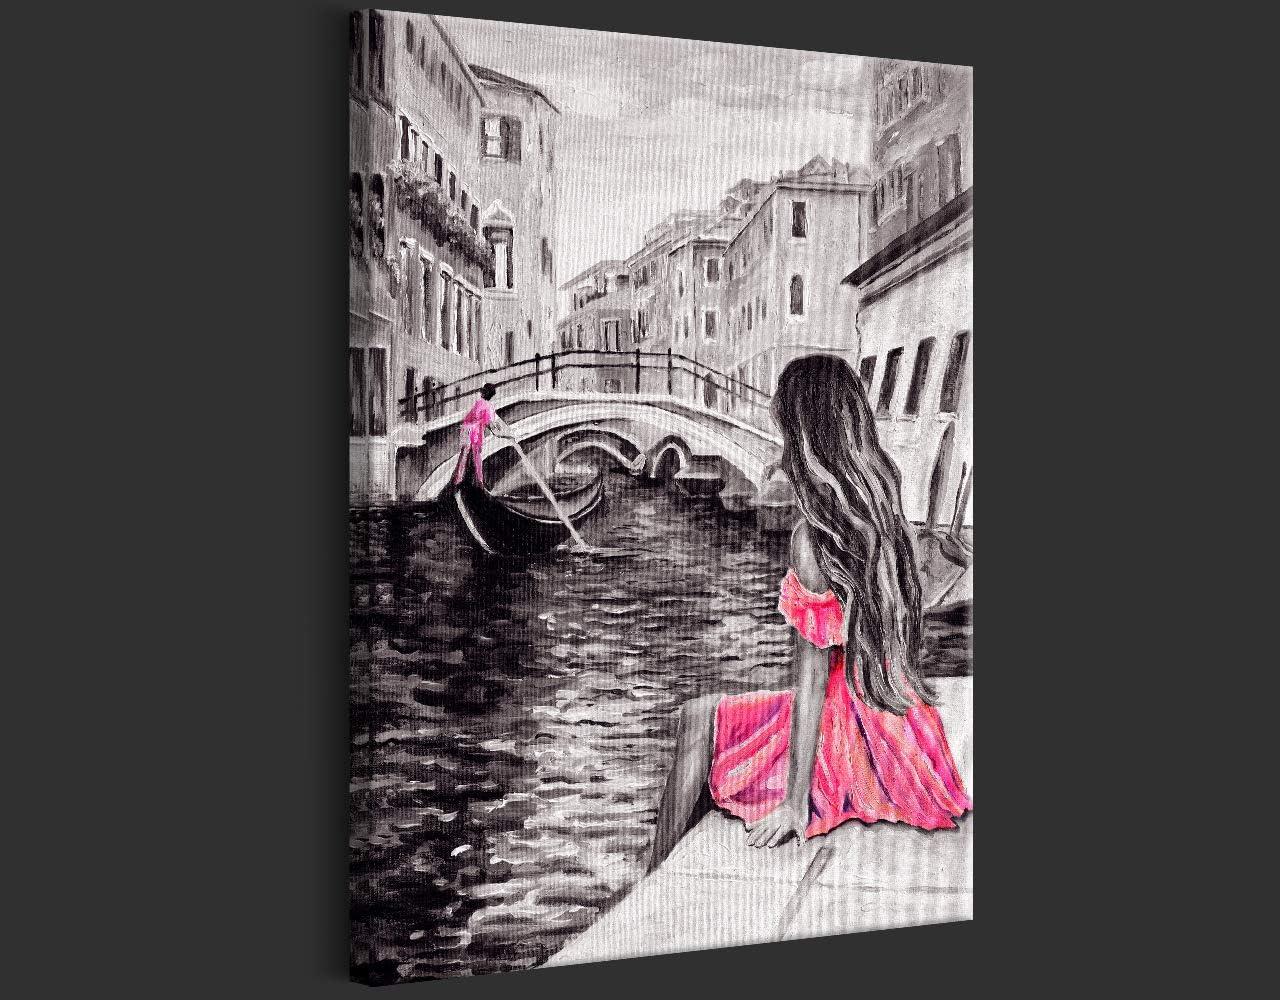 como Pintado Mujer Rosa d-B-0218-b-a 1 Parte Impresi/ón en Material Tejido no Tejido Impresi/ón Art/ística Imagen Gr/áfica Decoracion de Pared murando Cuadro en Lienzo Venecia Rio 60x90 cm